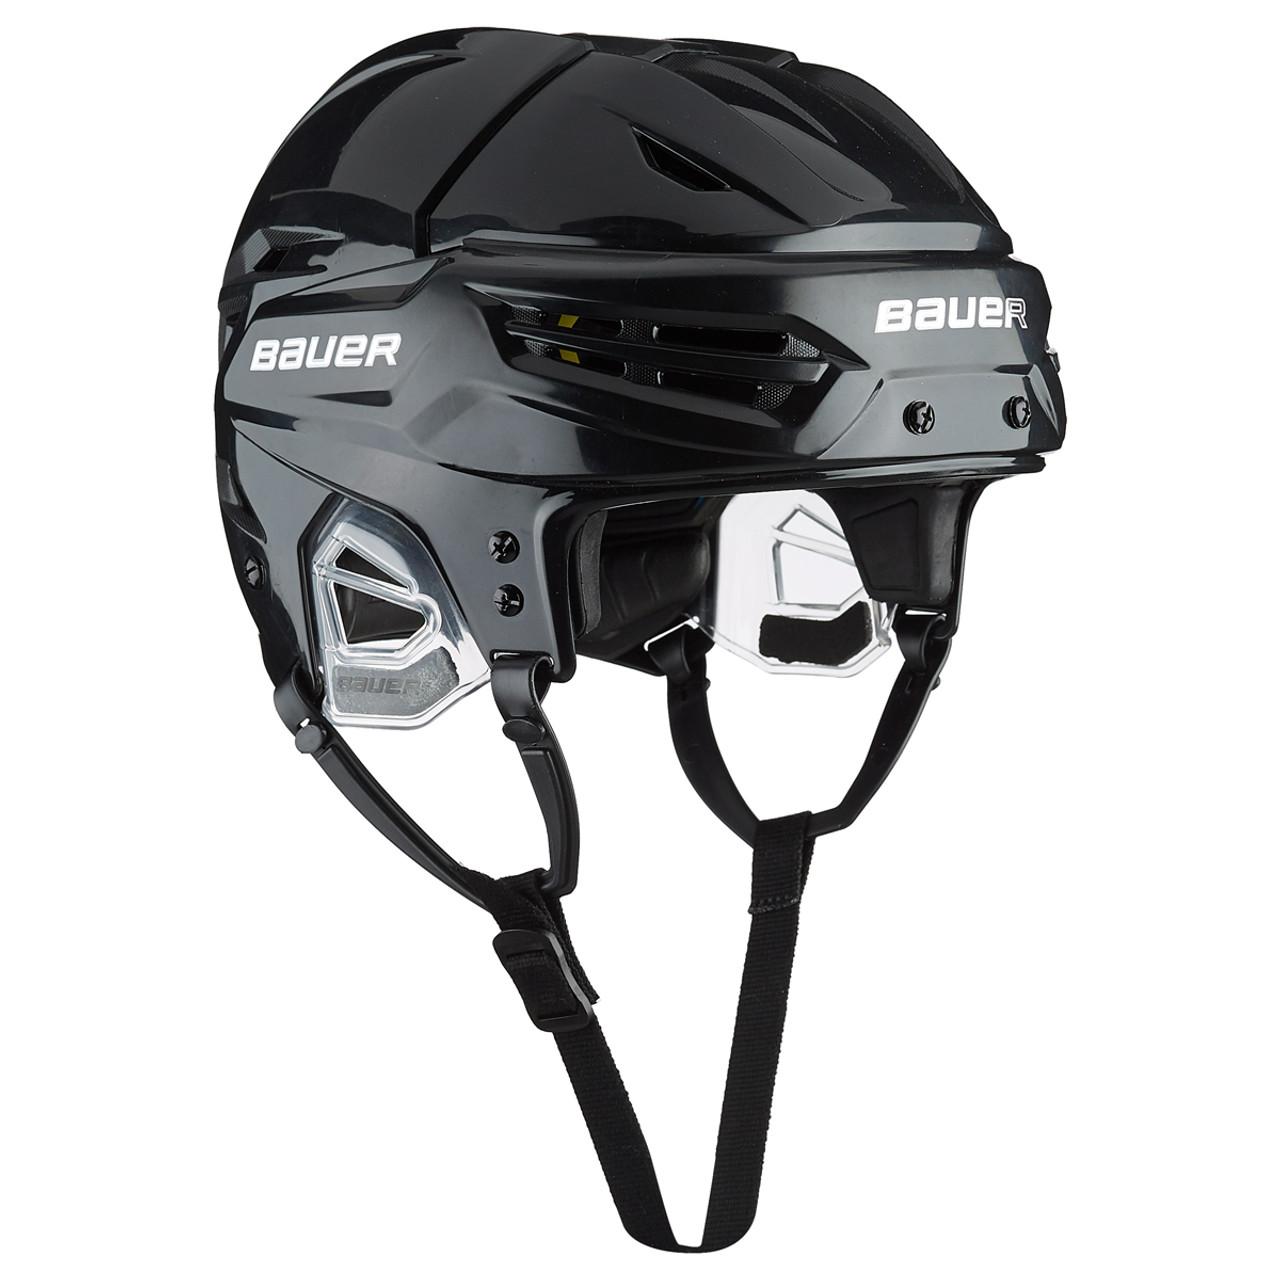 e724fe7f377 Bauer Re-AKT 95 Senior Ice Hockey Helmet ...